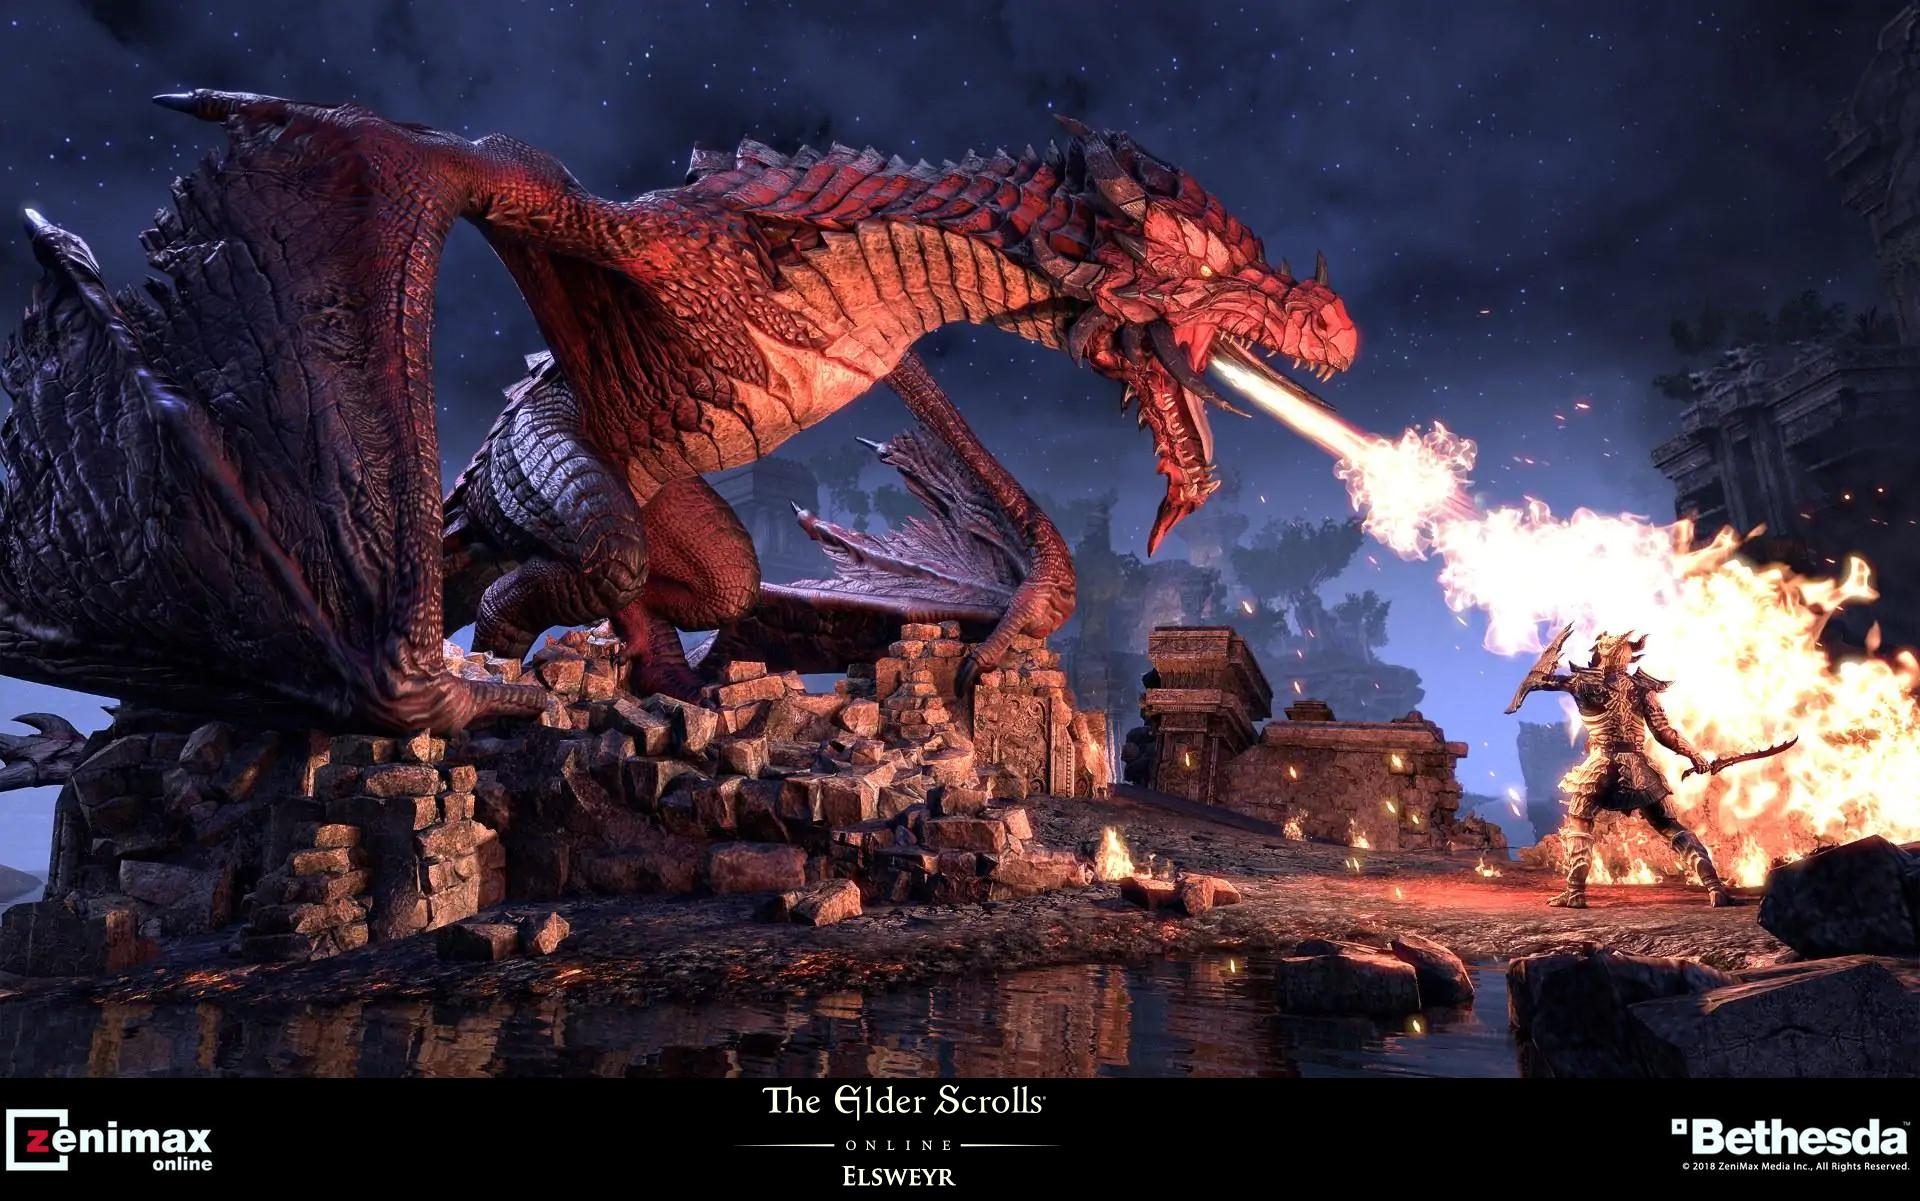 Ricardo graham reddragon realtime gamescreenshot01